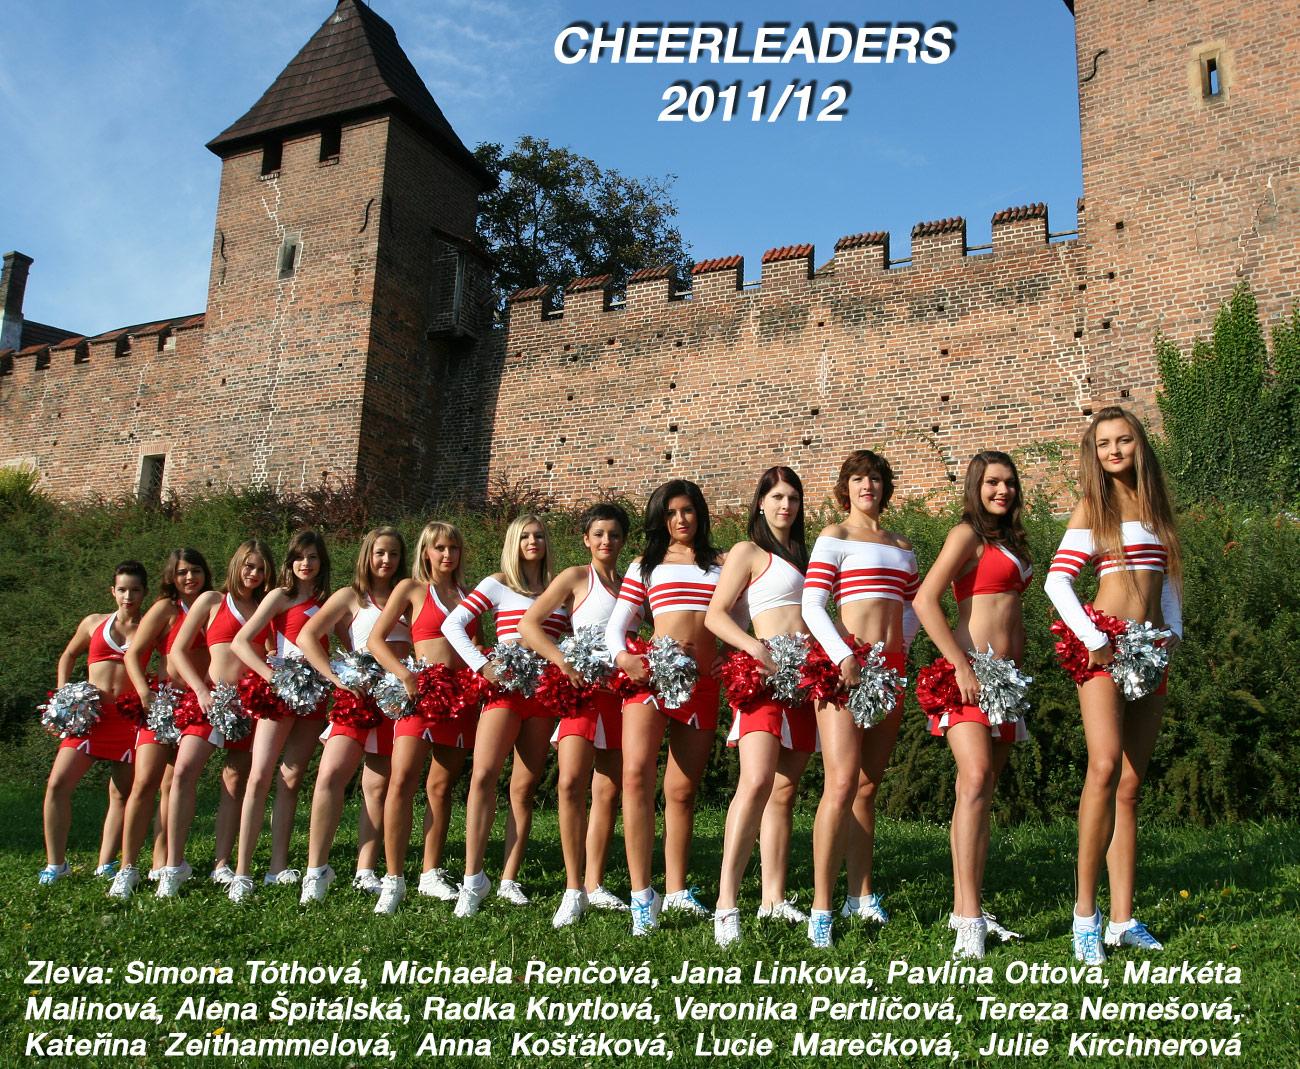 Cheerleaders_společná fotka 2011-12